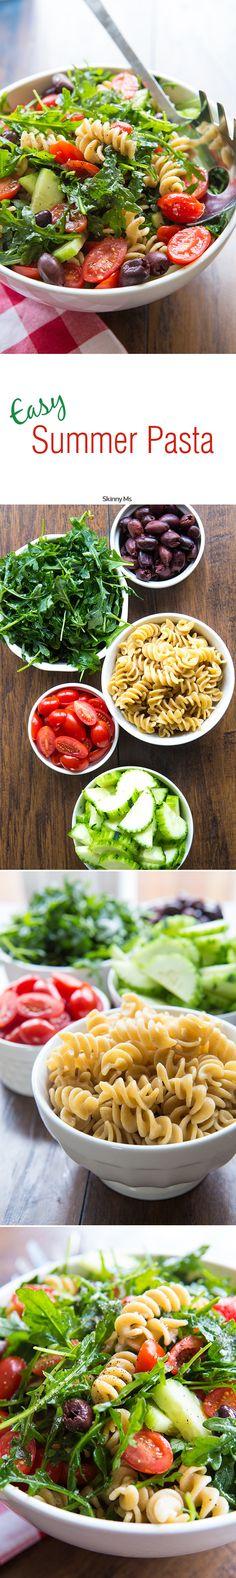 Easy Pasta Salad with Cucumbers & Tomatoes Einfacher Nudelsalat mit Gurken & Tomaten – lecker! Cucumber Pasta Salad, Easy Pasta Salad, Arugula Recipes, Cucumber Recipes, Pasta Recipes, Salad Recipes, Cooking Recipes, Pasta With Arugula And Tomatoes, Healthy Snacks